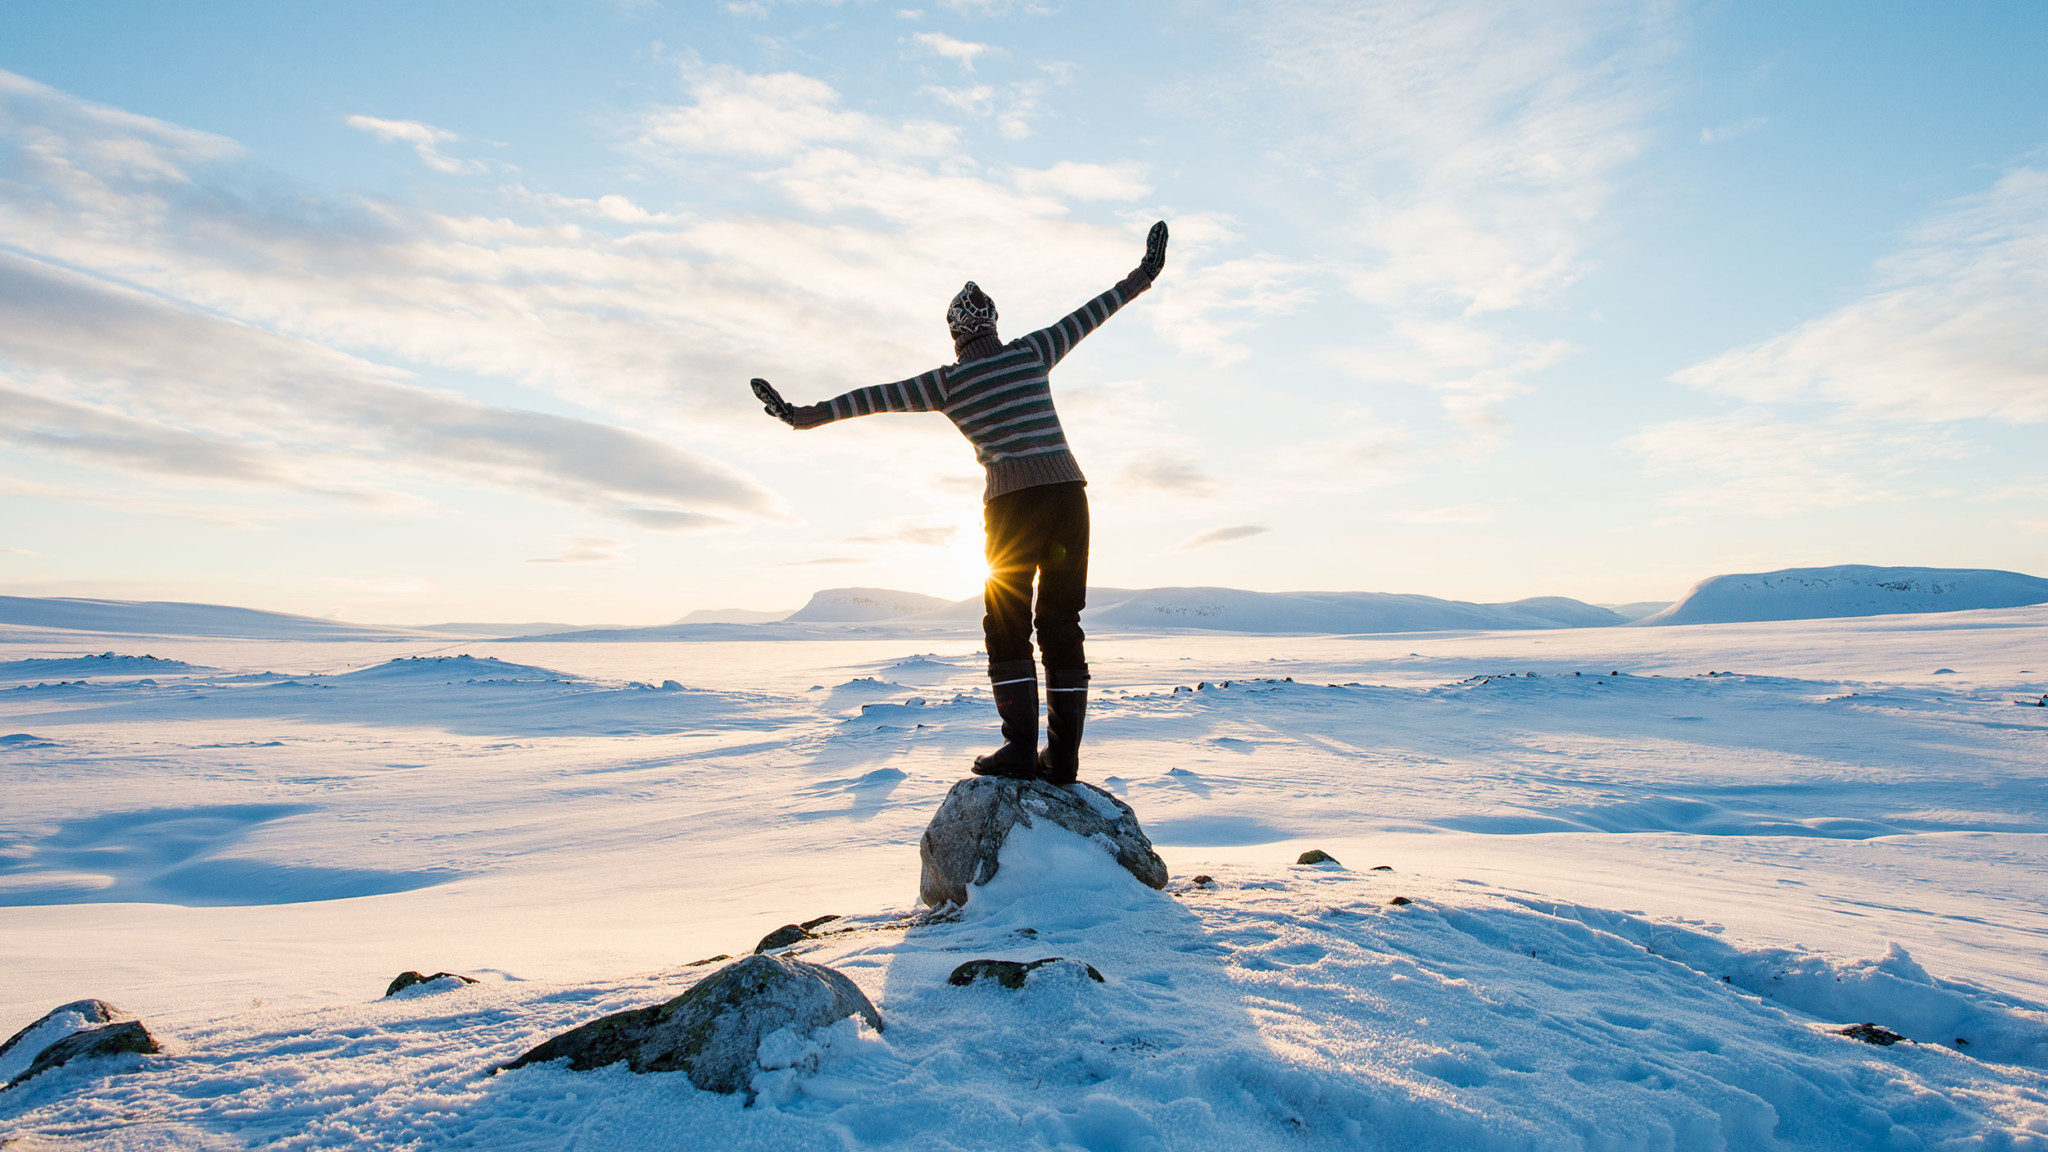 Other Lapland destinations - Visit Rovaniemi